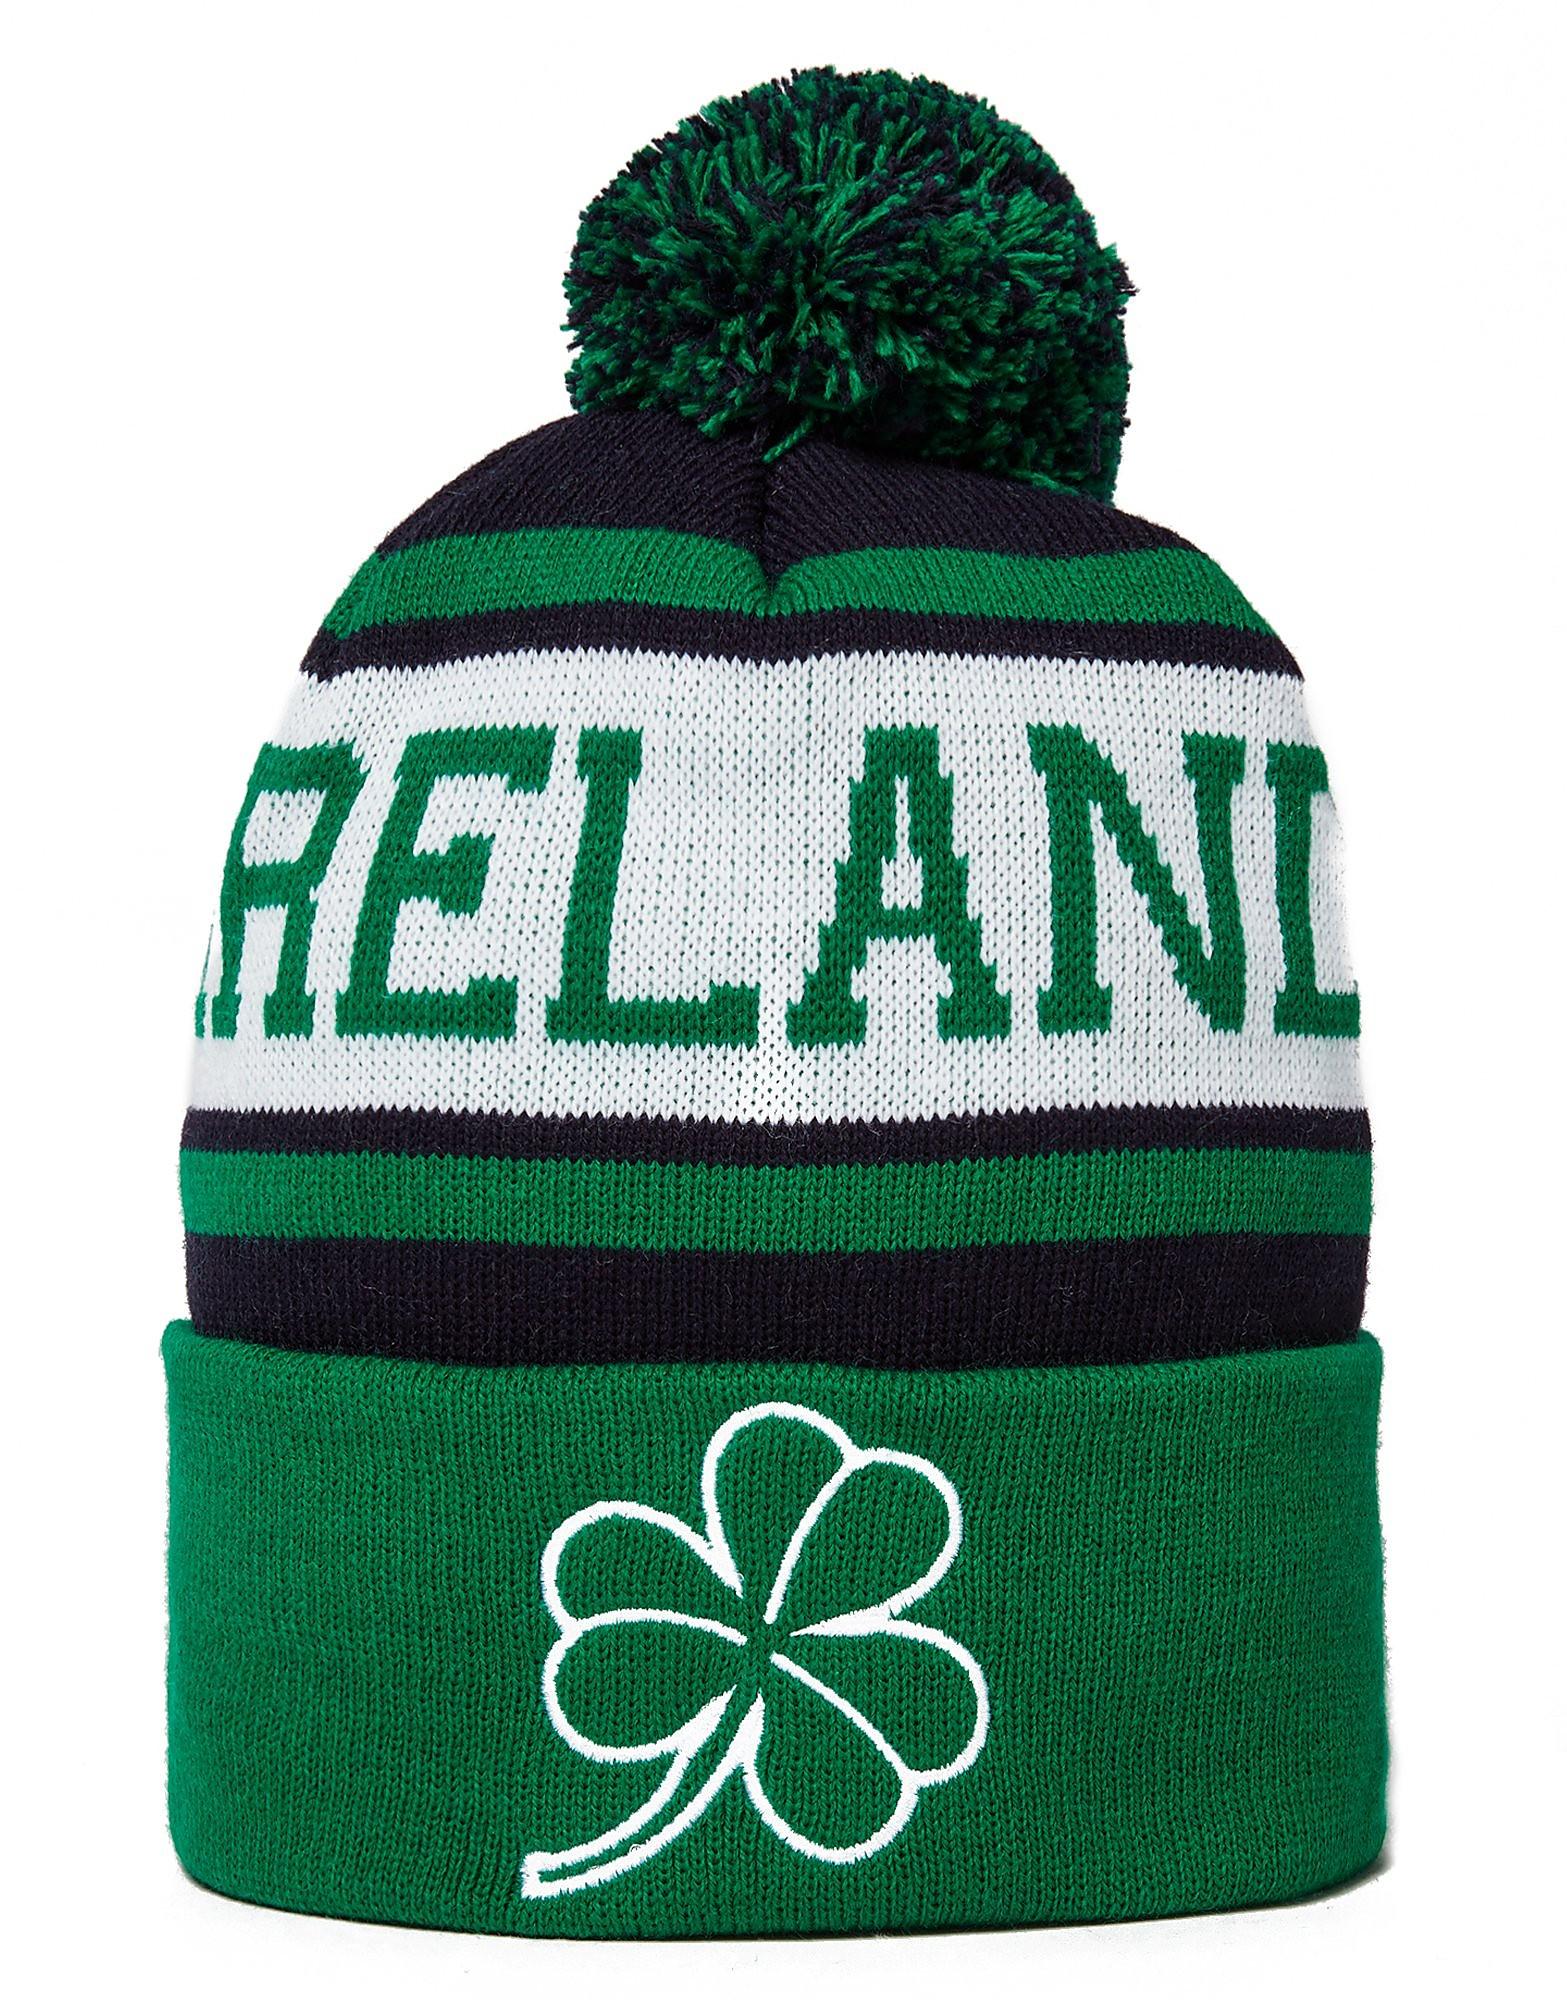 Official Team Bonnet Irlande